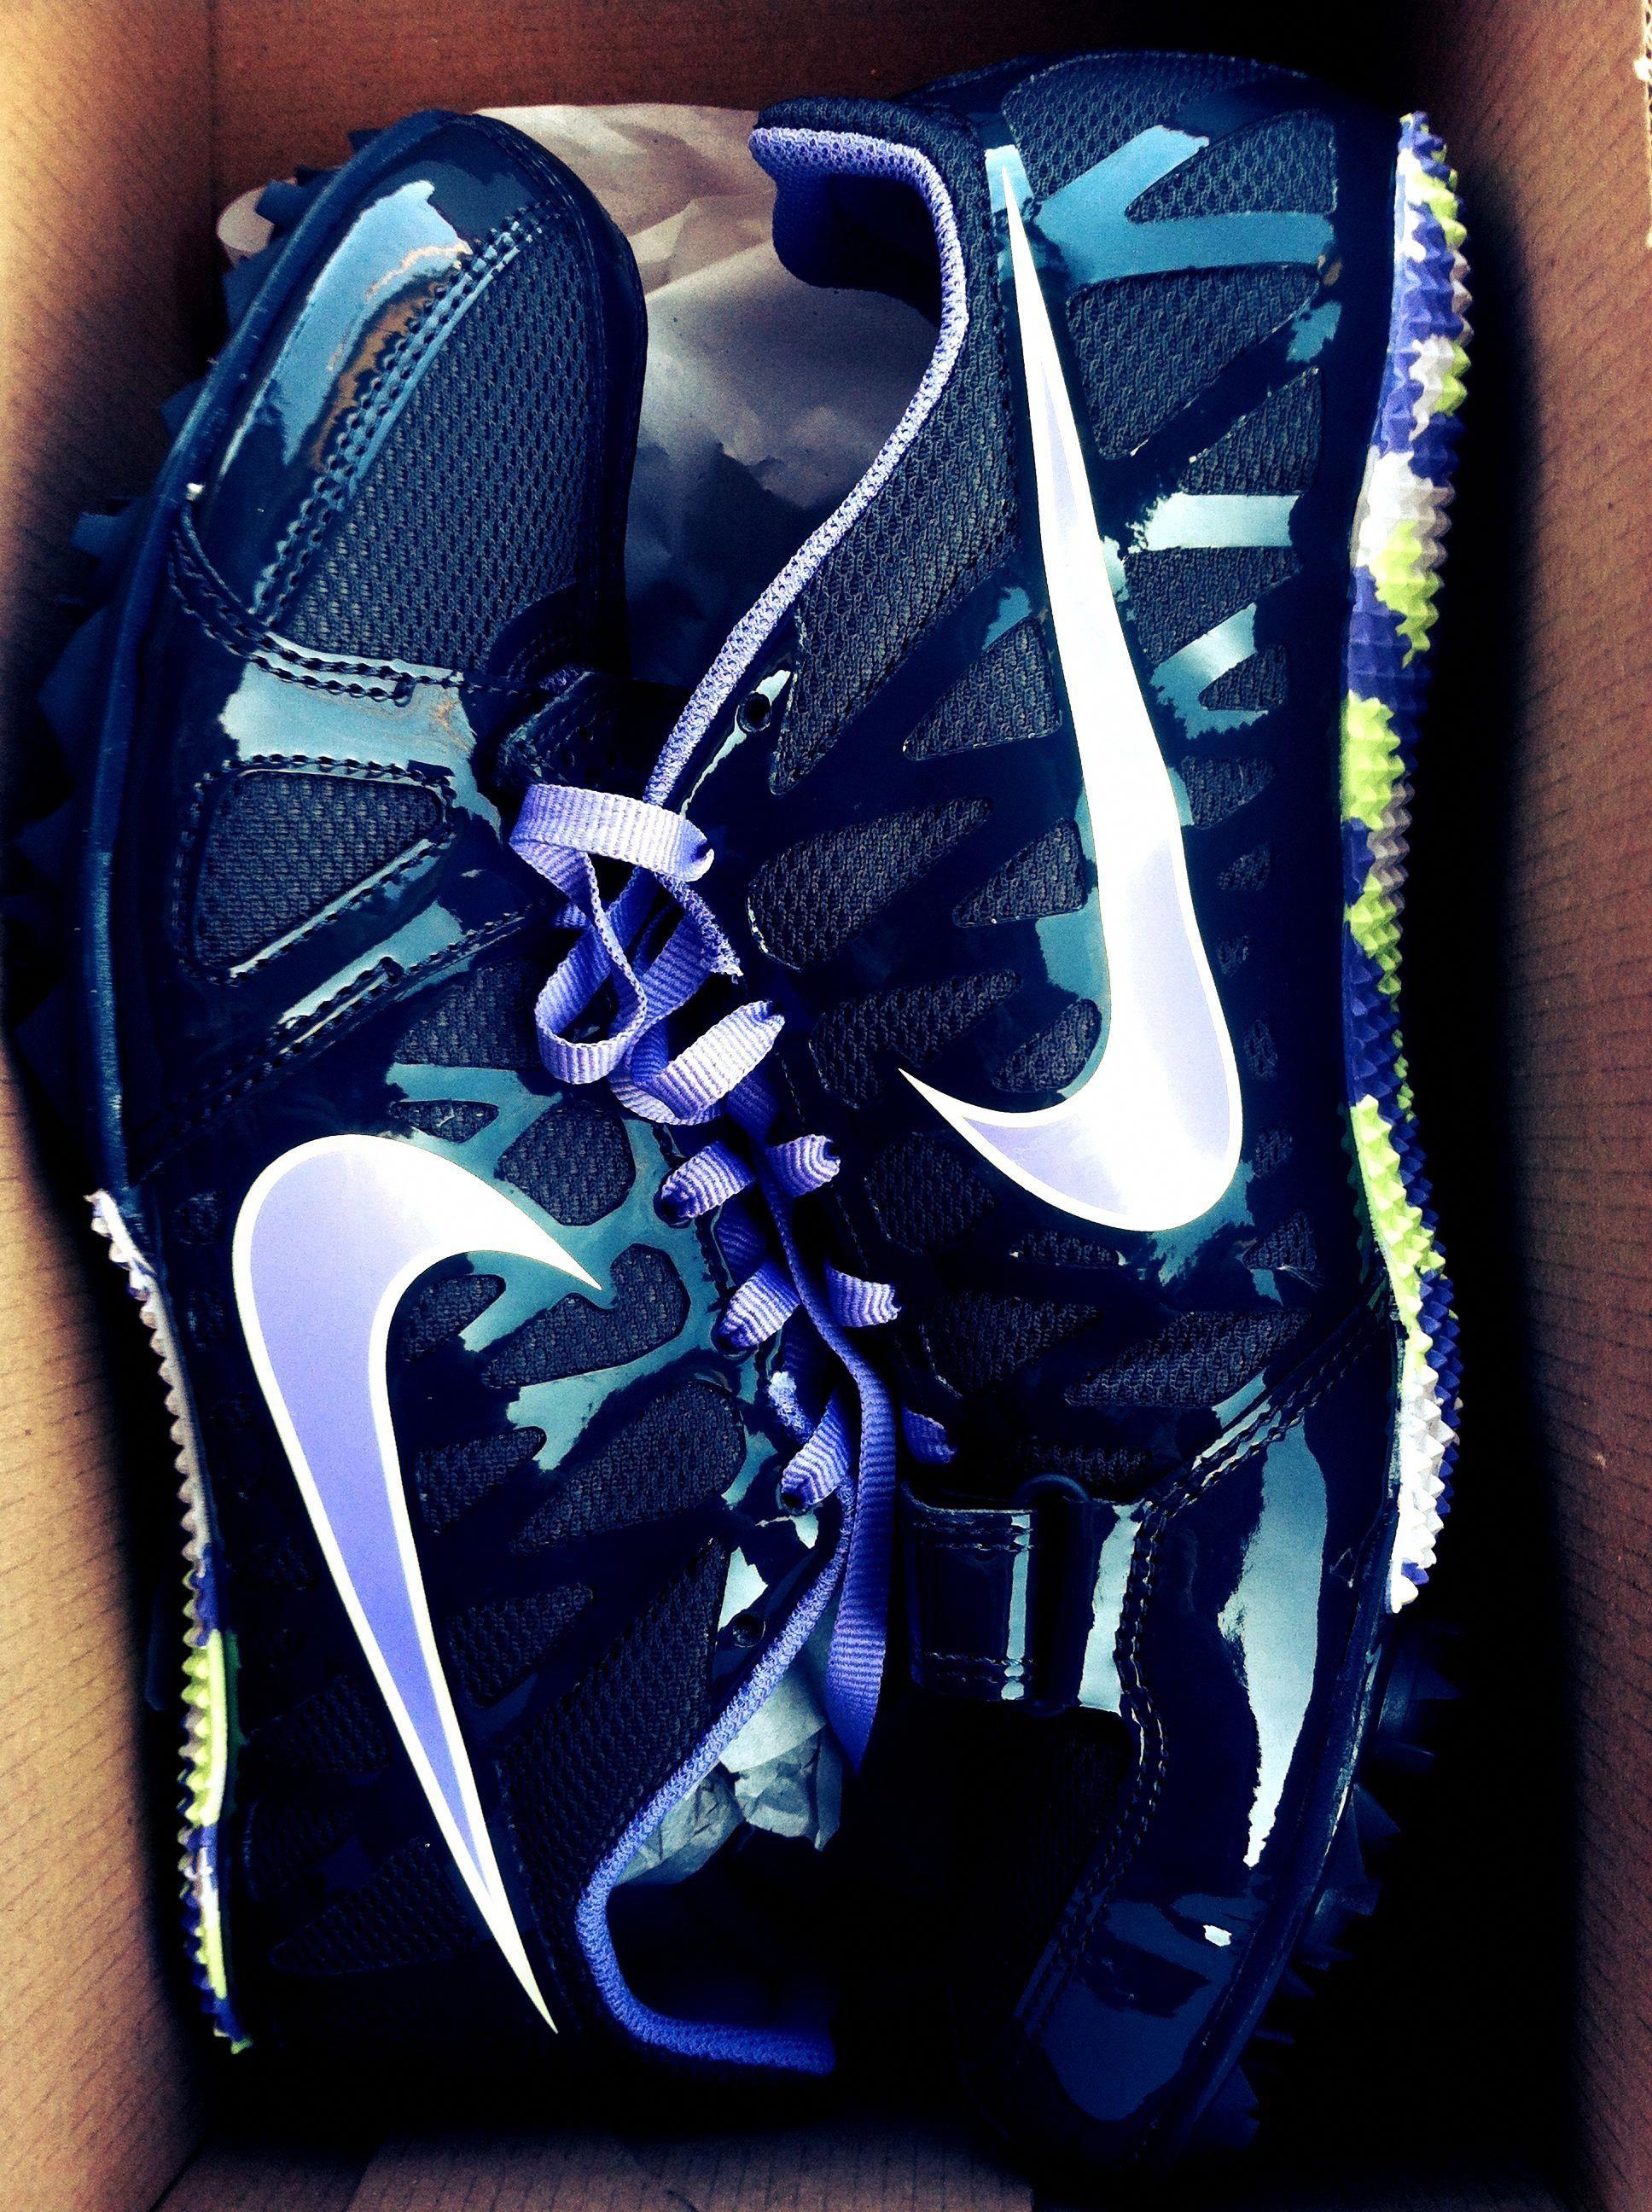 9c153050d71da Track shoes!